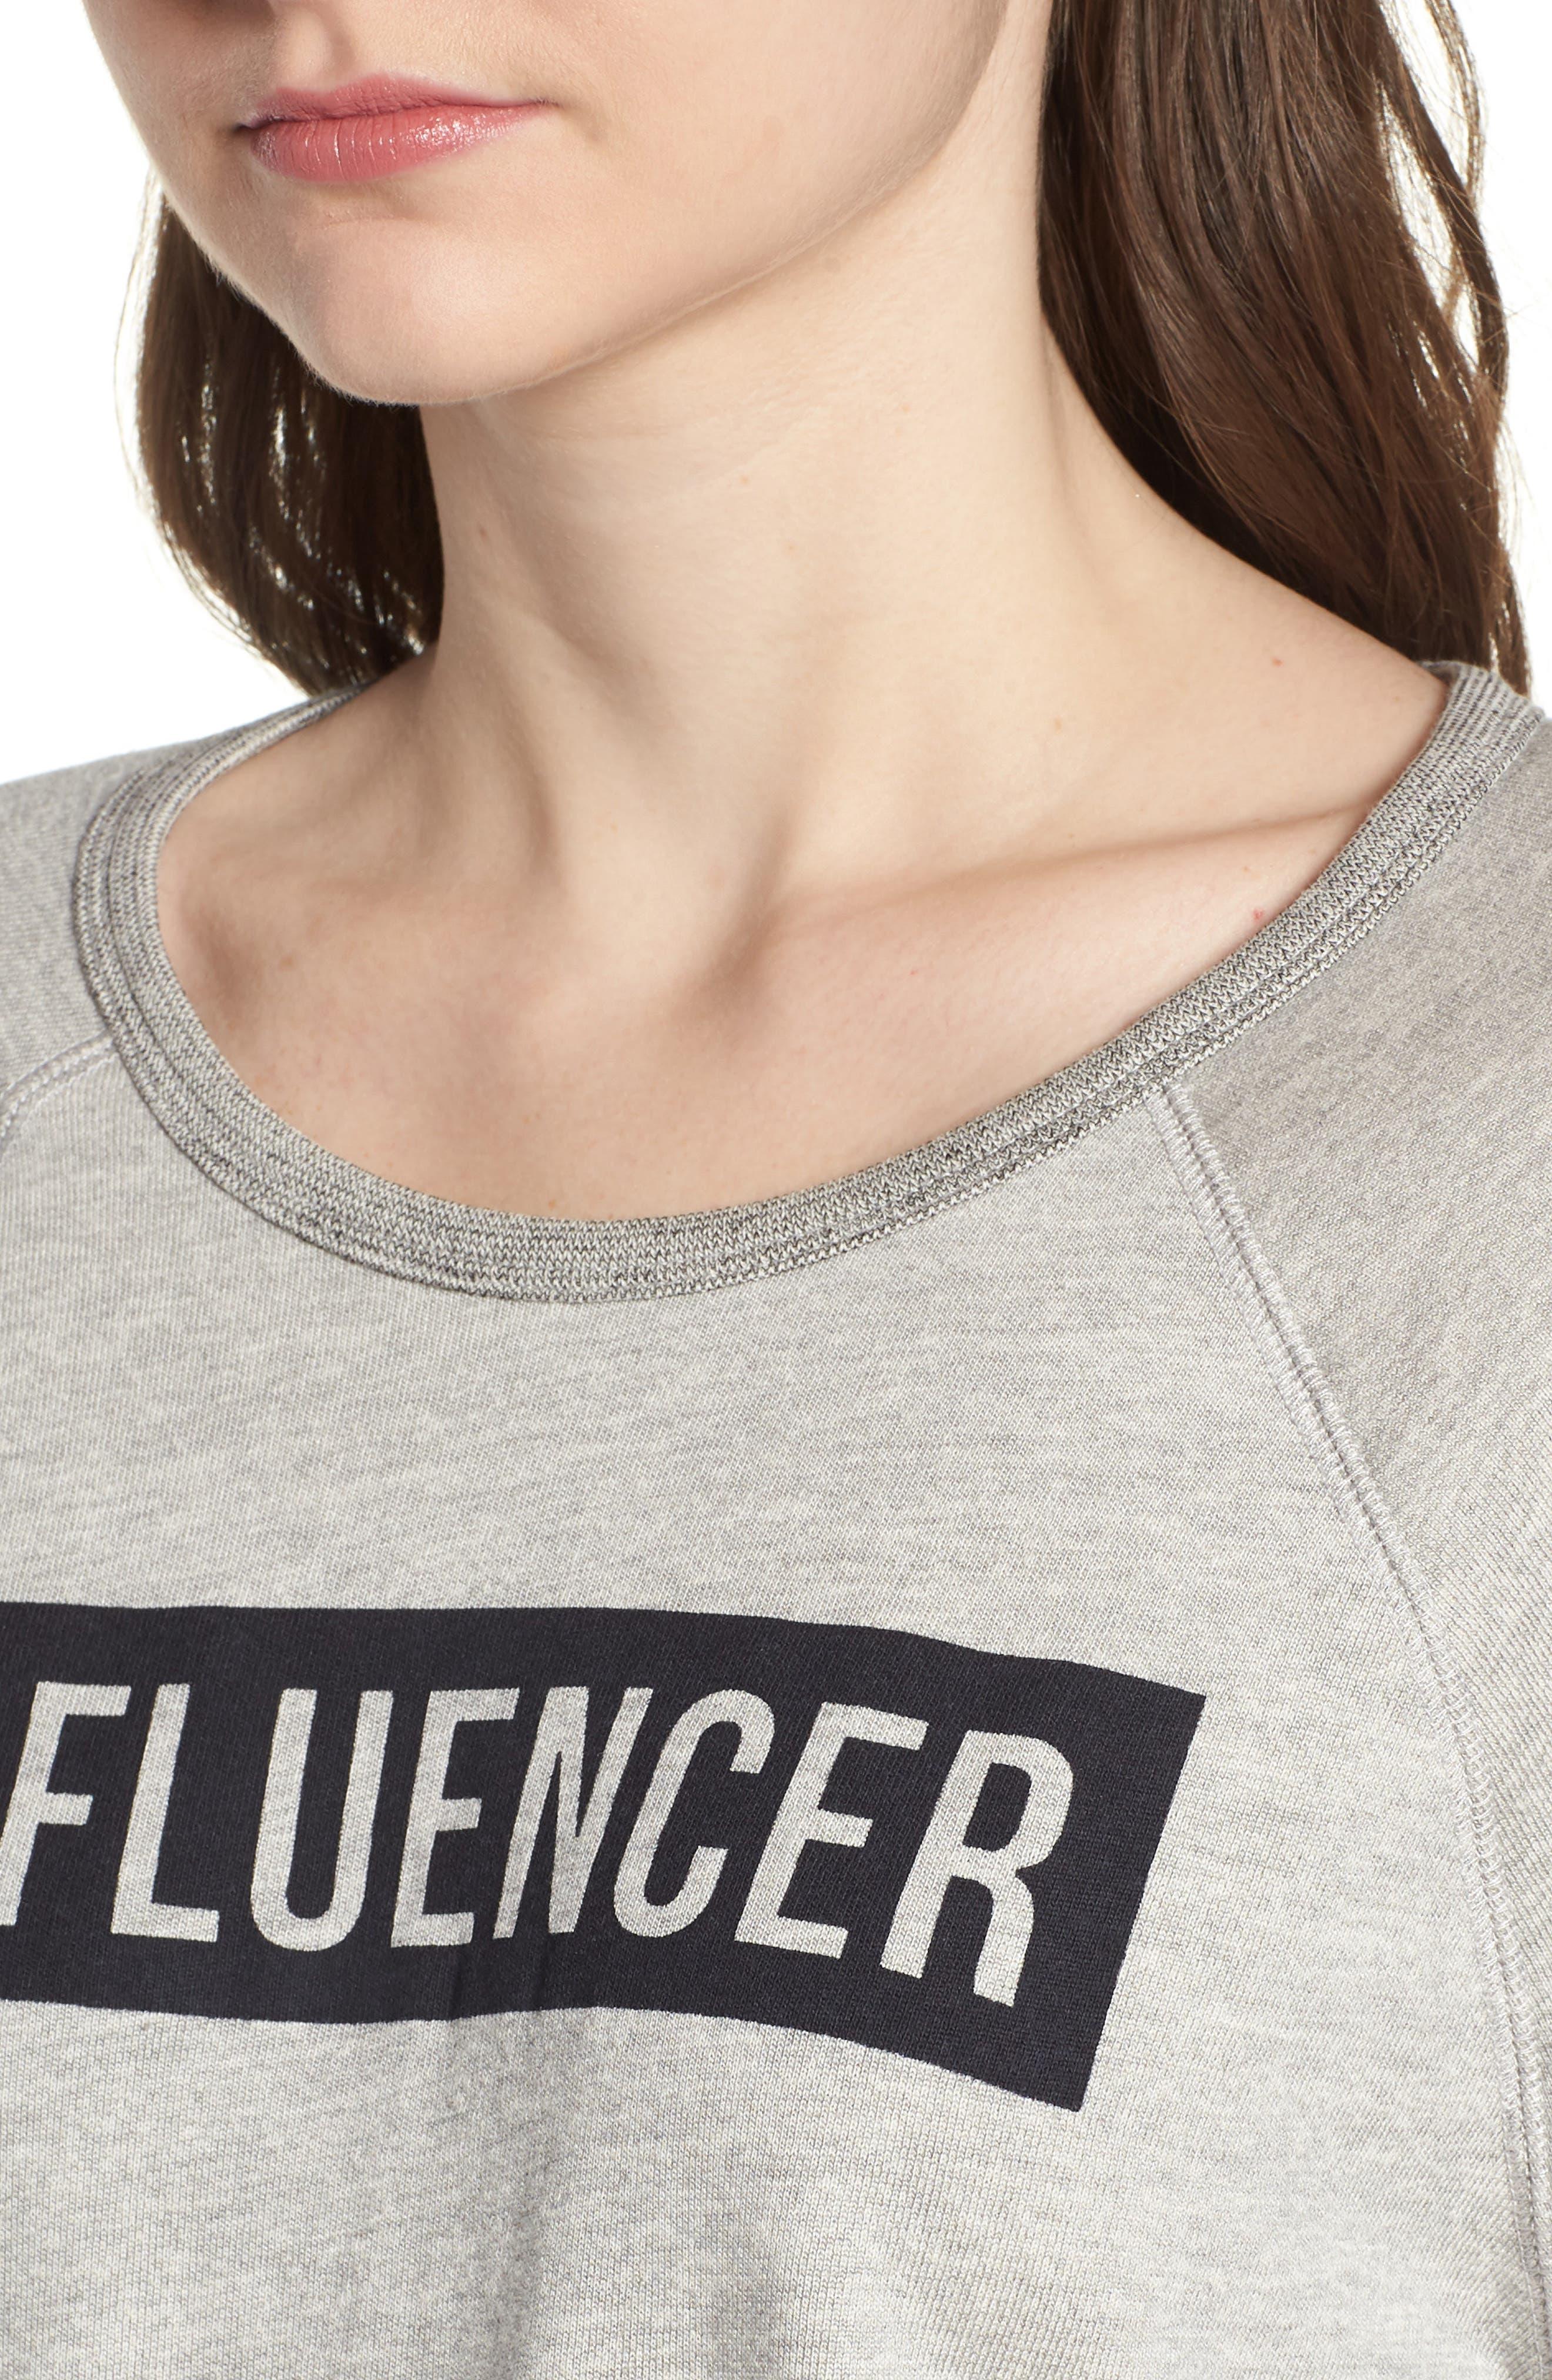 Influencer Sweatshirt,                             Alternate thumbnail 4, color,                             039